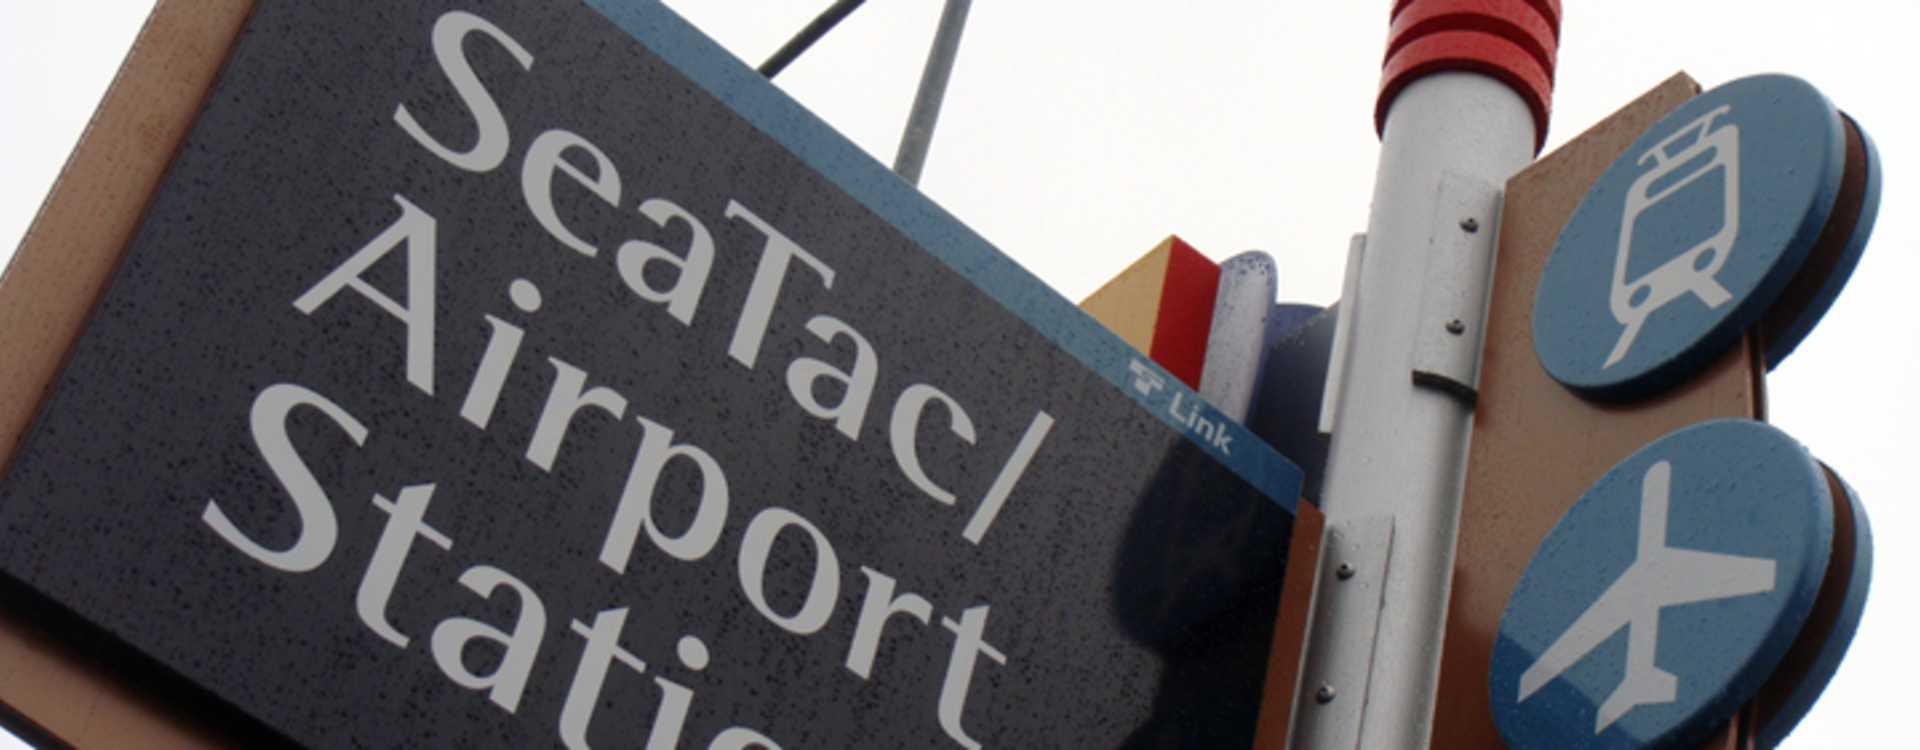 SeaTac Airport Station